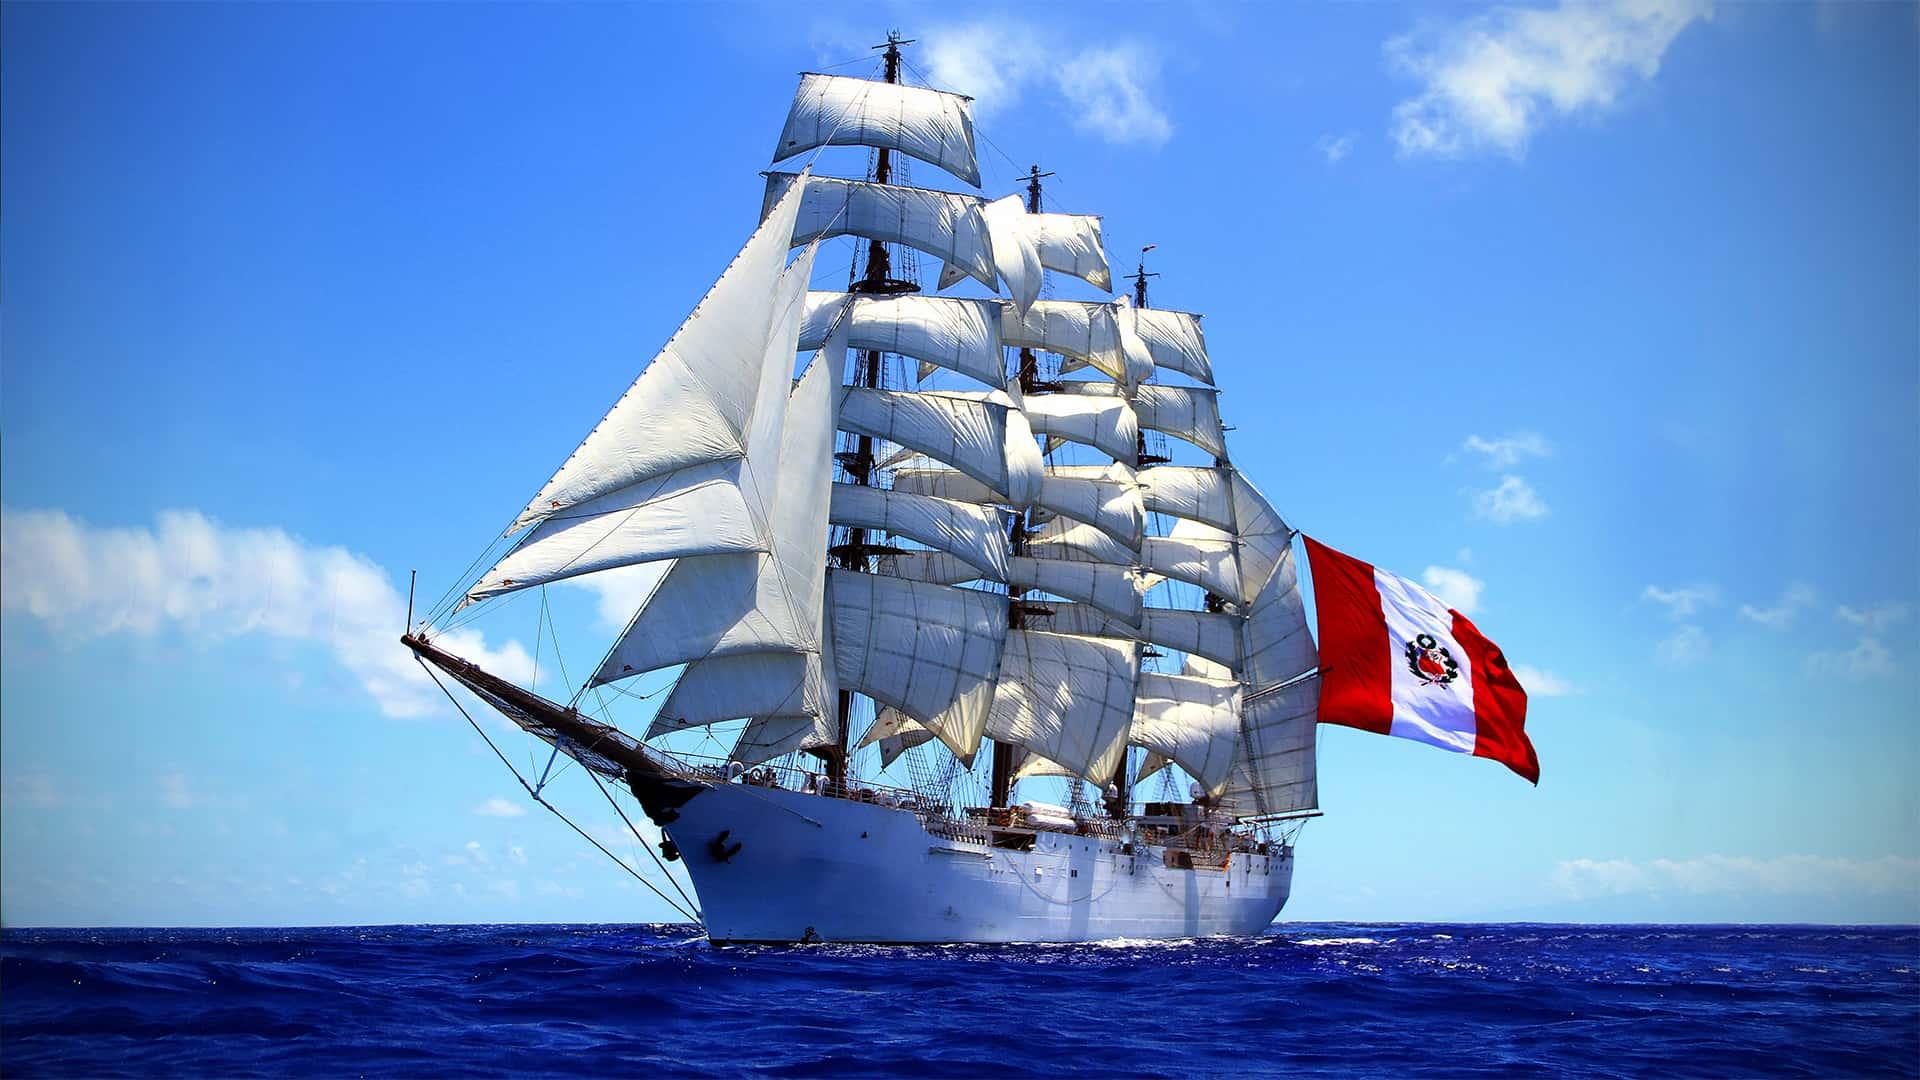 Peruvian Tall Ship